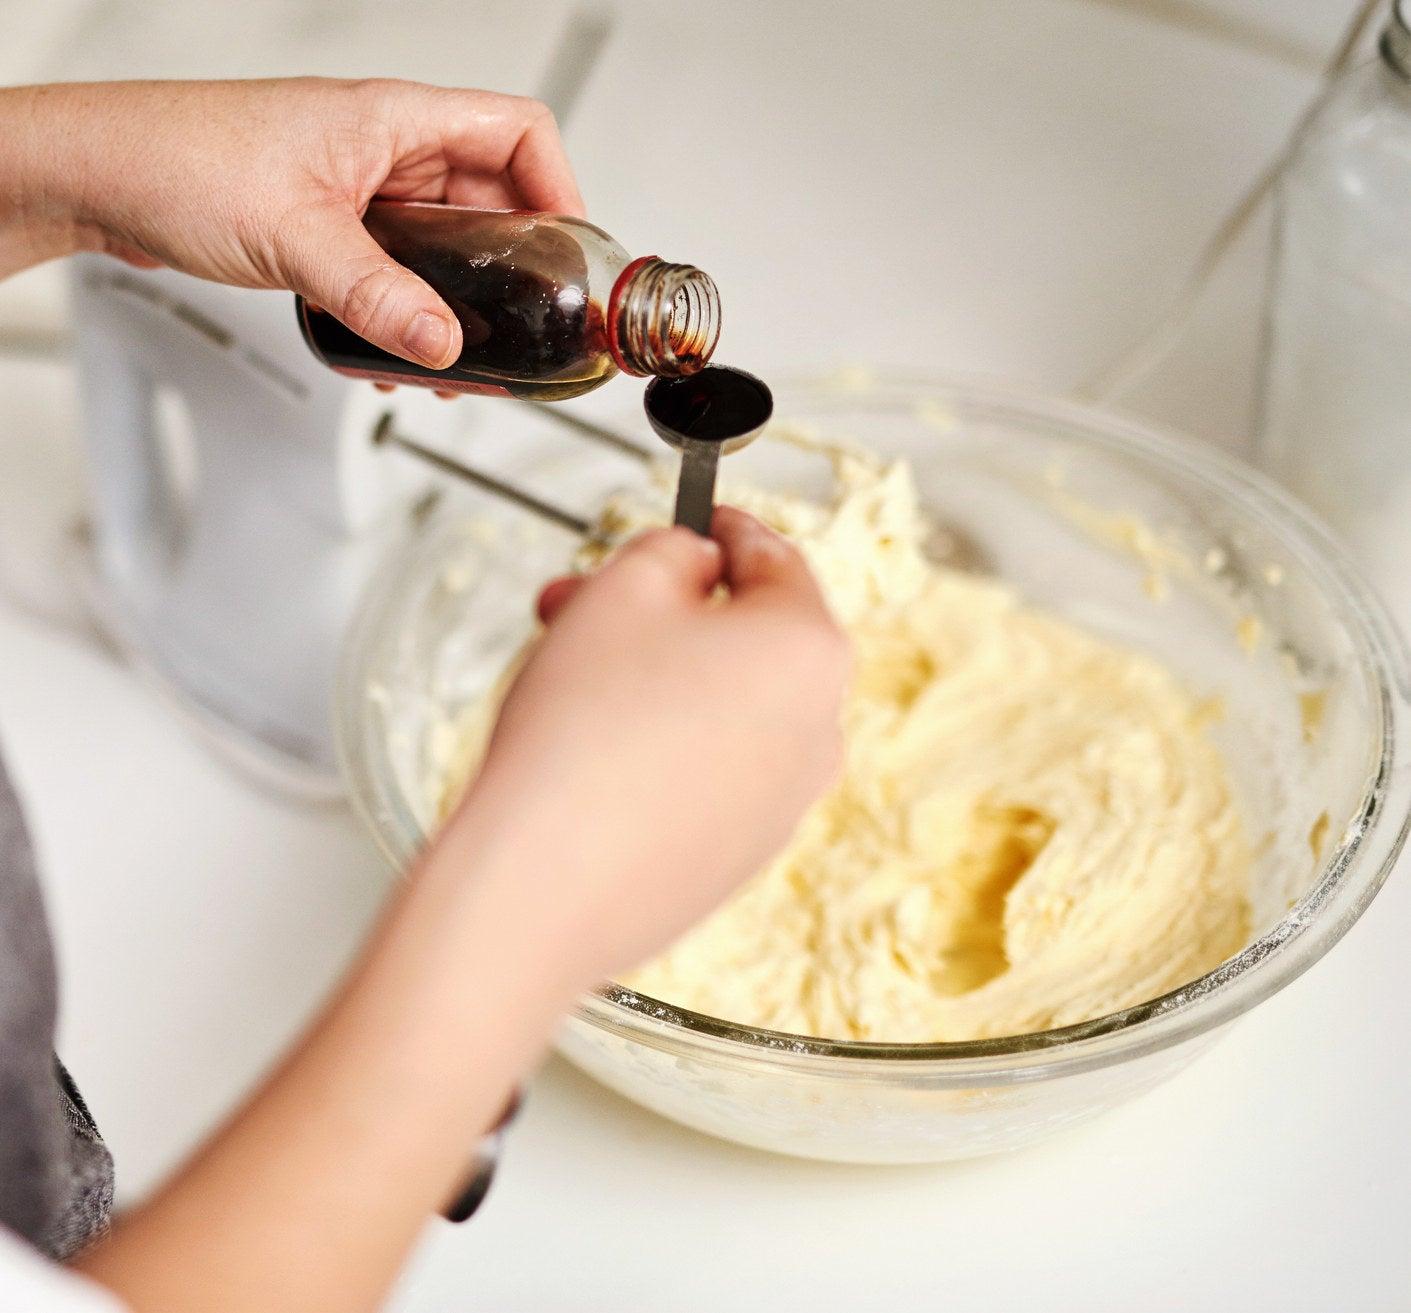 Baking with vanilla extract